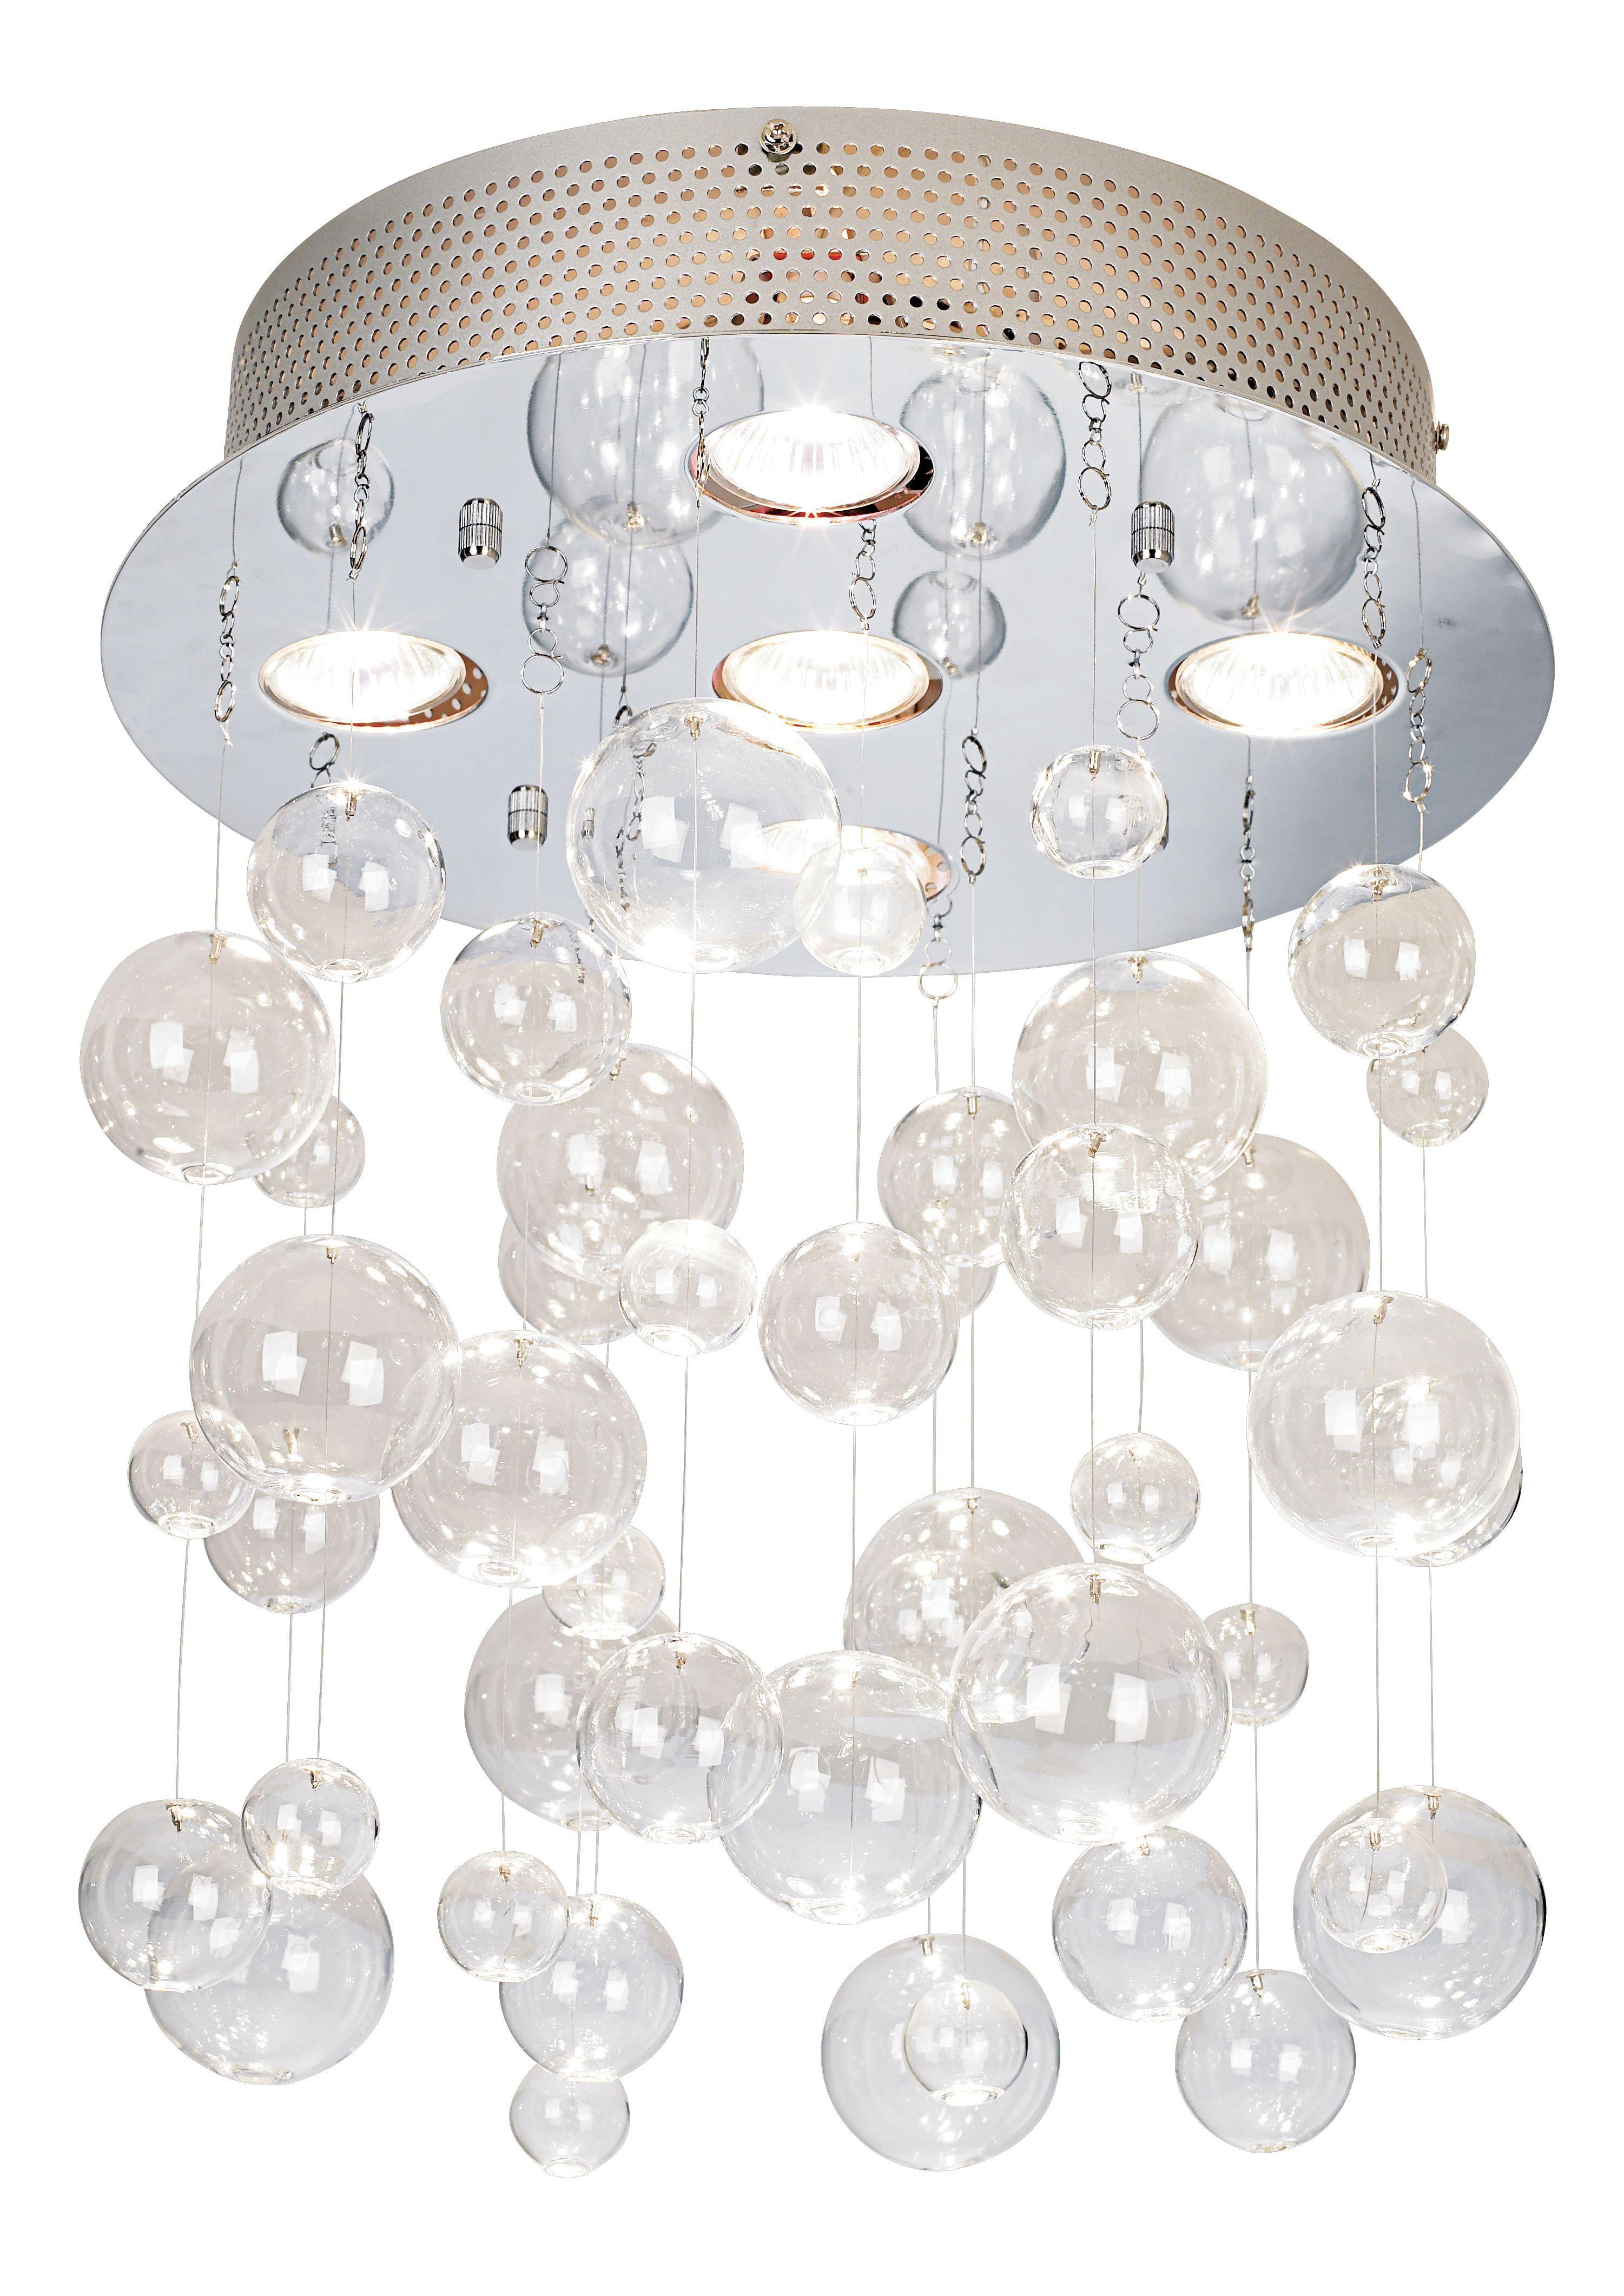 Possini euro chrome clear glass bubbles ceiling light possini euro chrome clear glass bubbles ceiling light eurostylelighting i waaaant this arubaitofo Choice Image